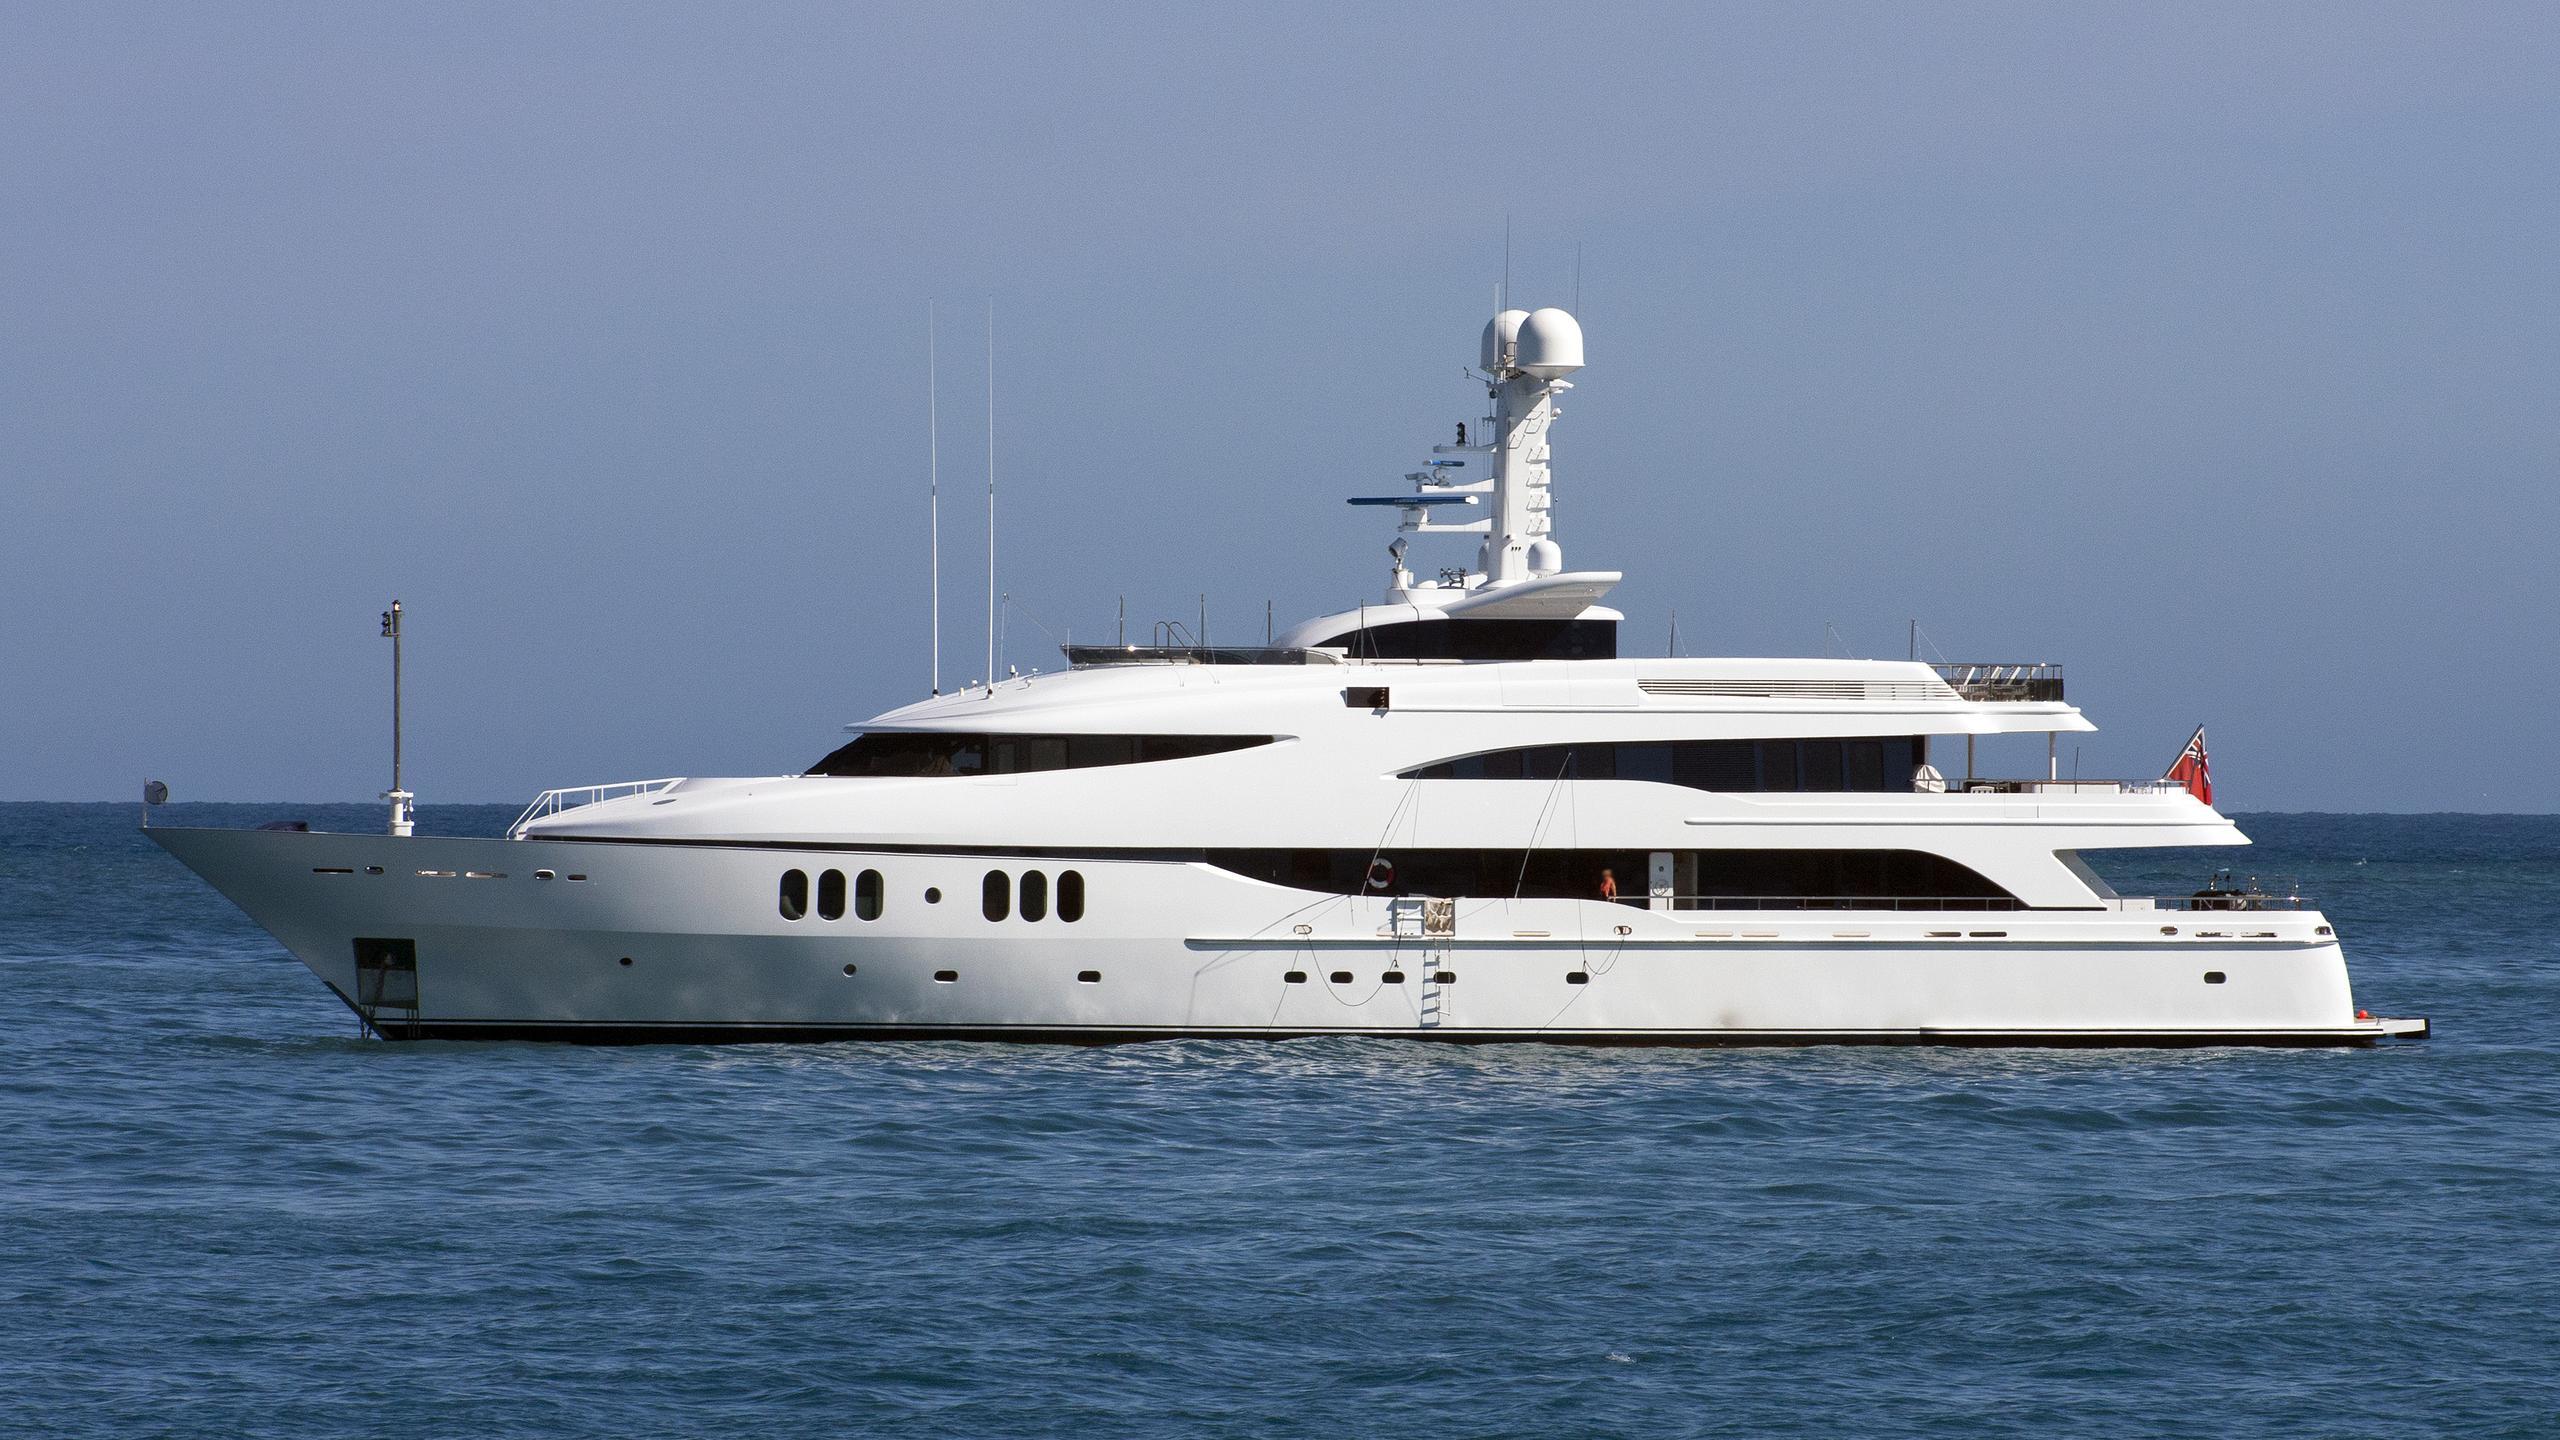 diamond-a-motor-yacht-abeking-rasmussen-1998-57m-profile